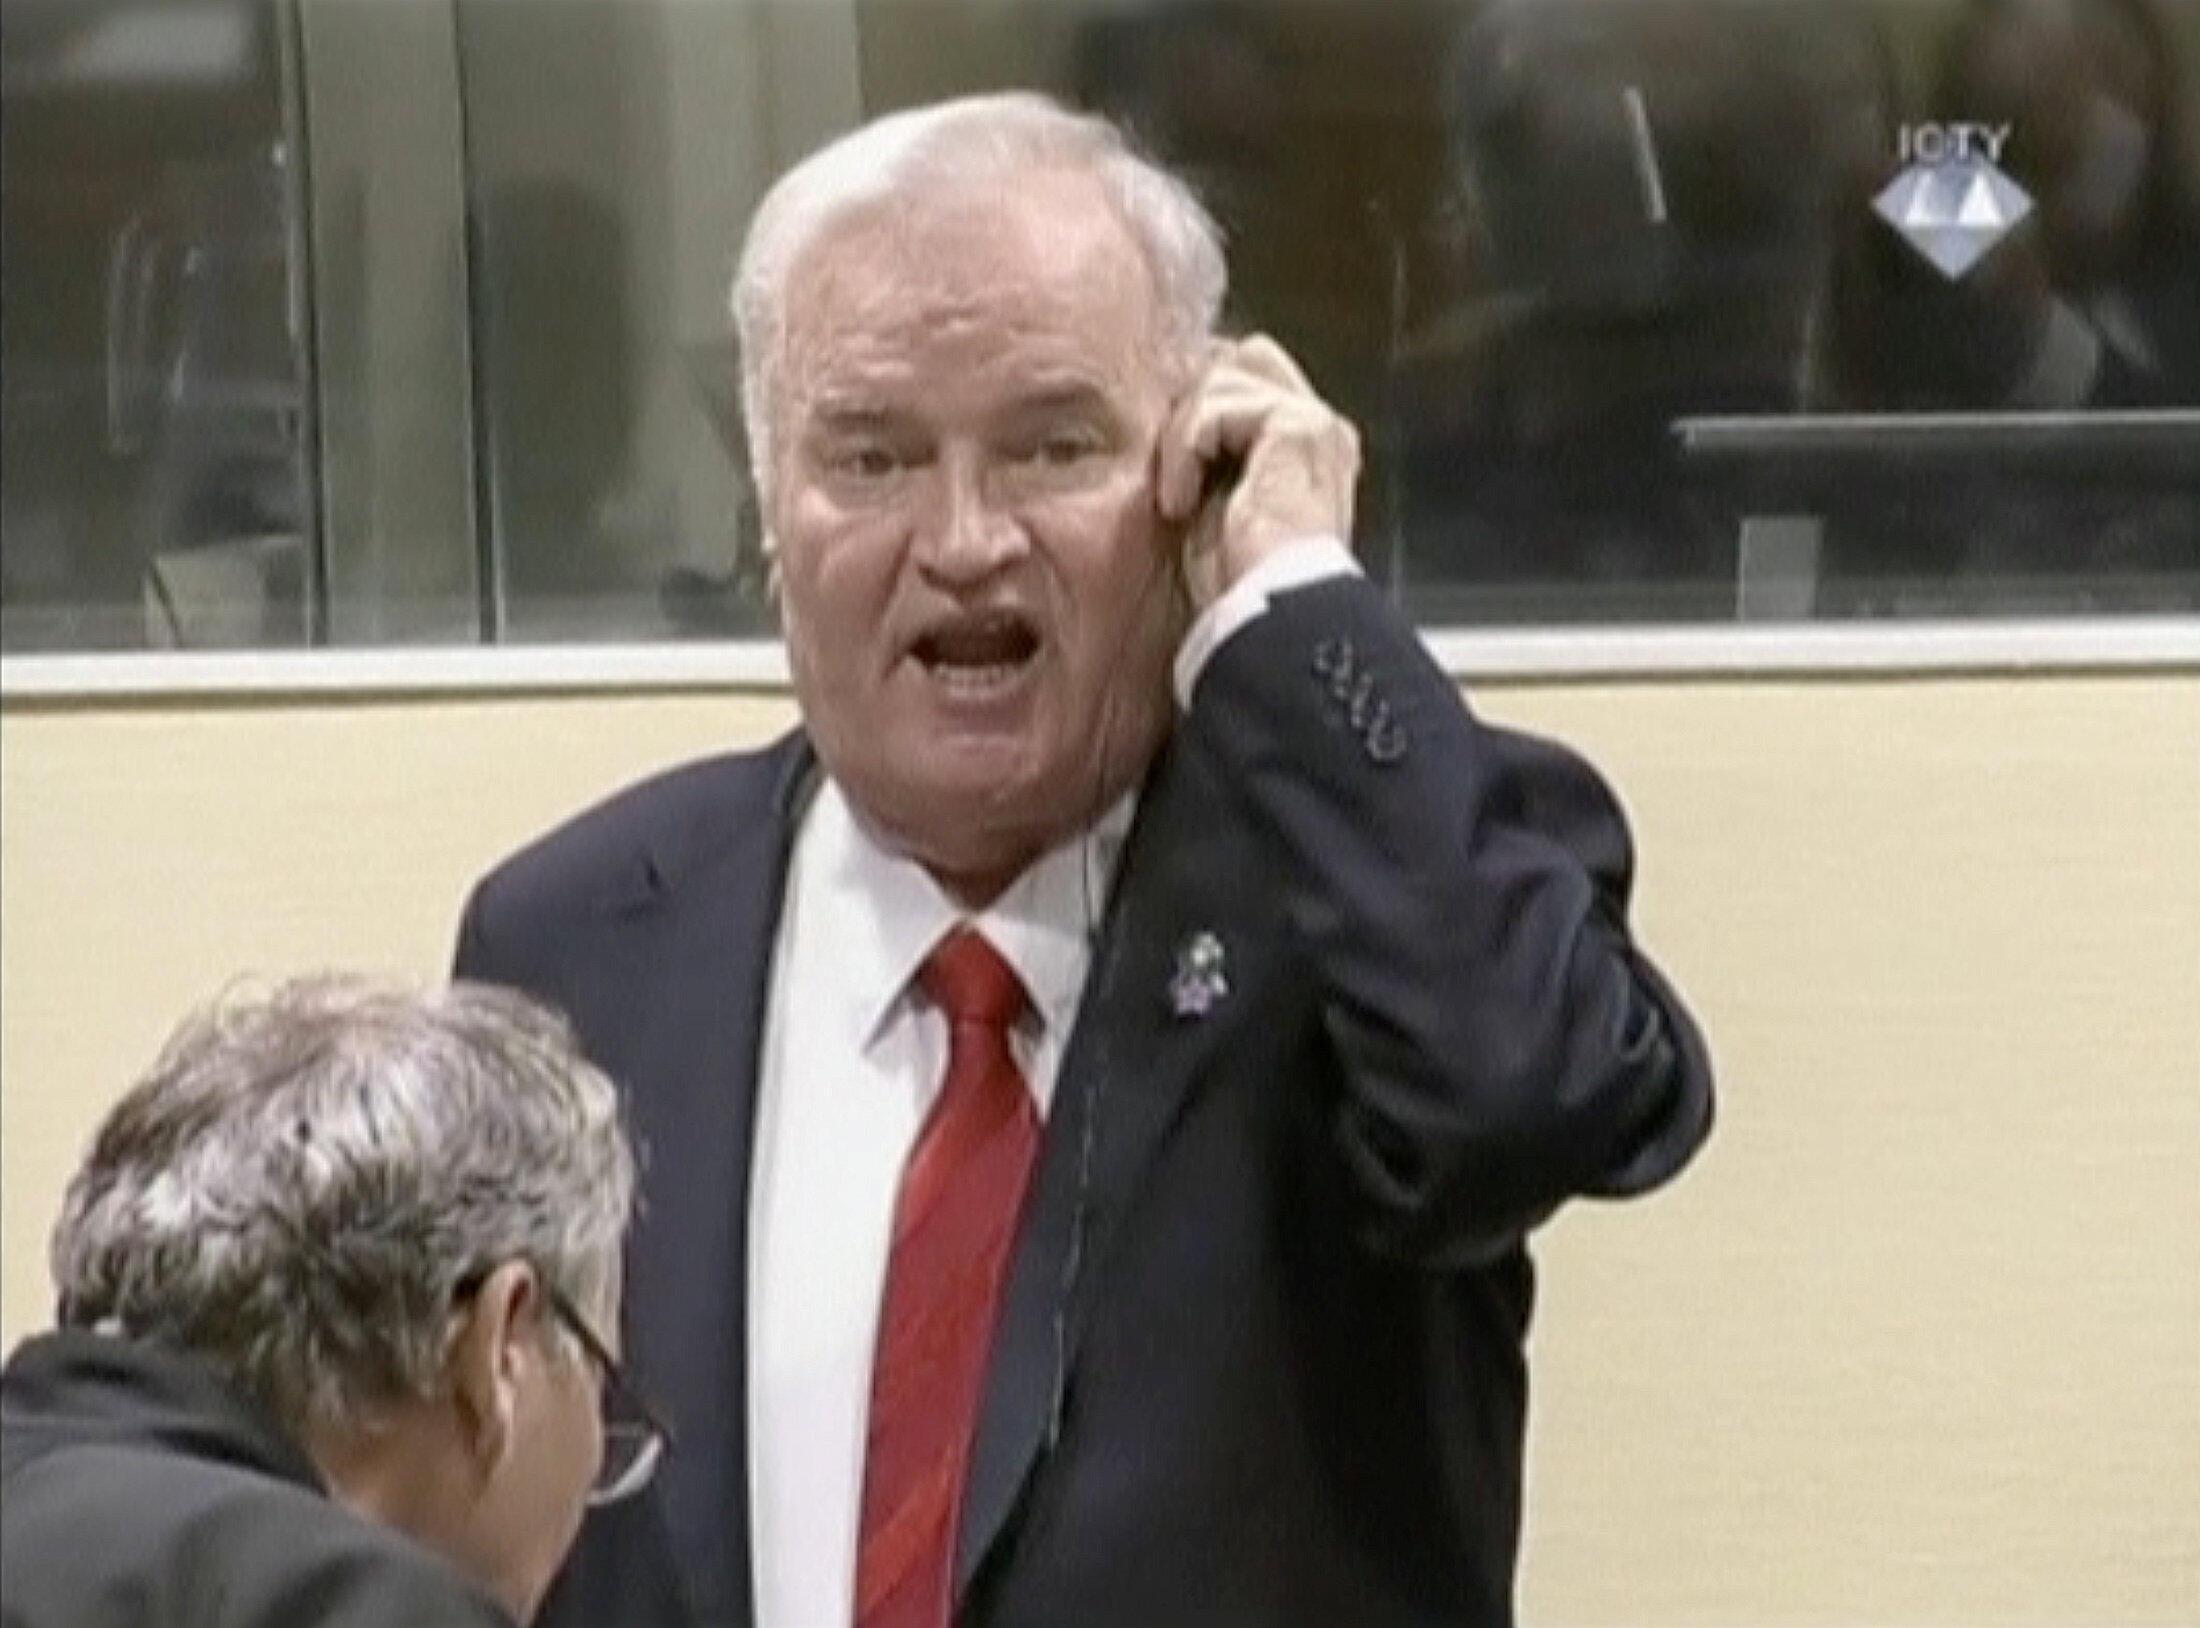 Ratko Mladic at the International Criminal Tribunal for the former Yugoslavia (ICTY)